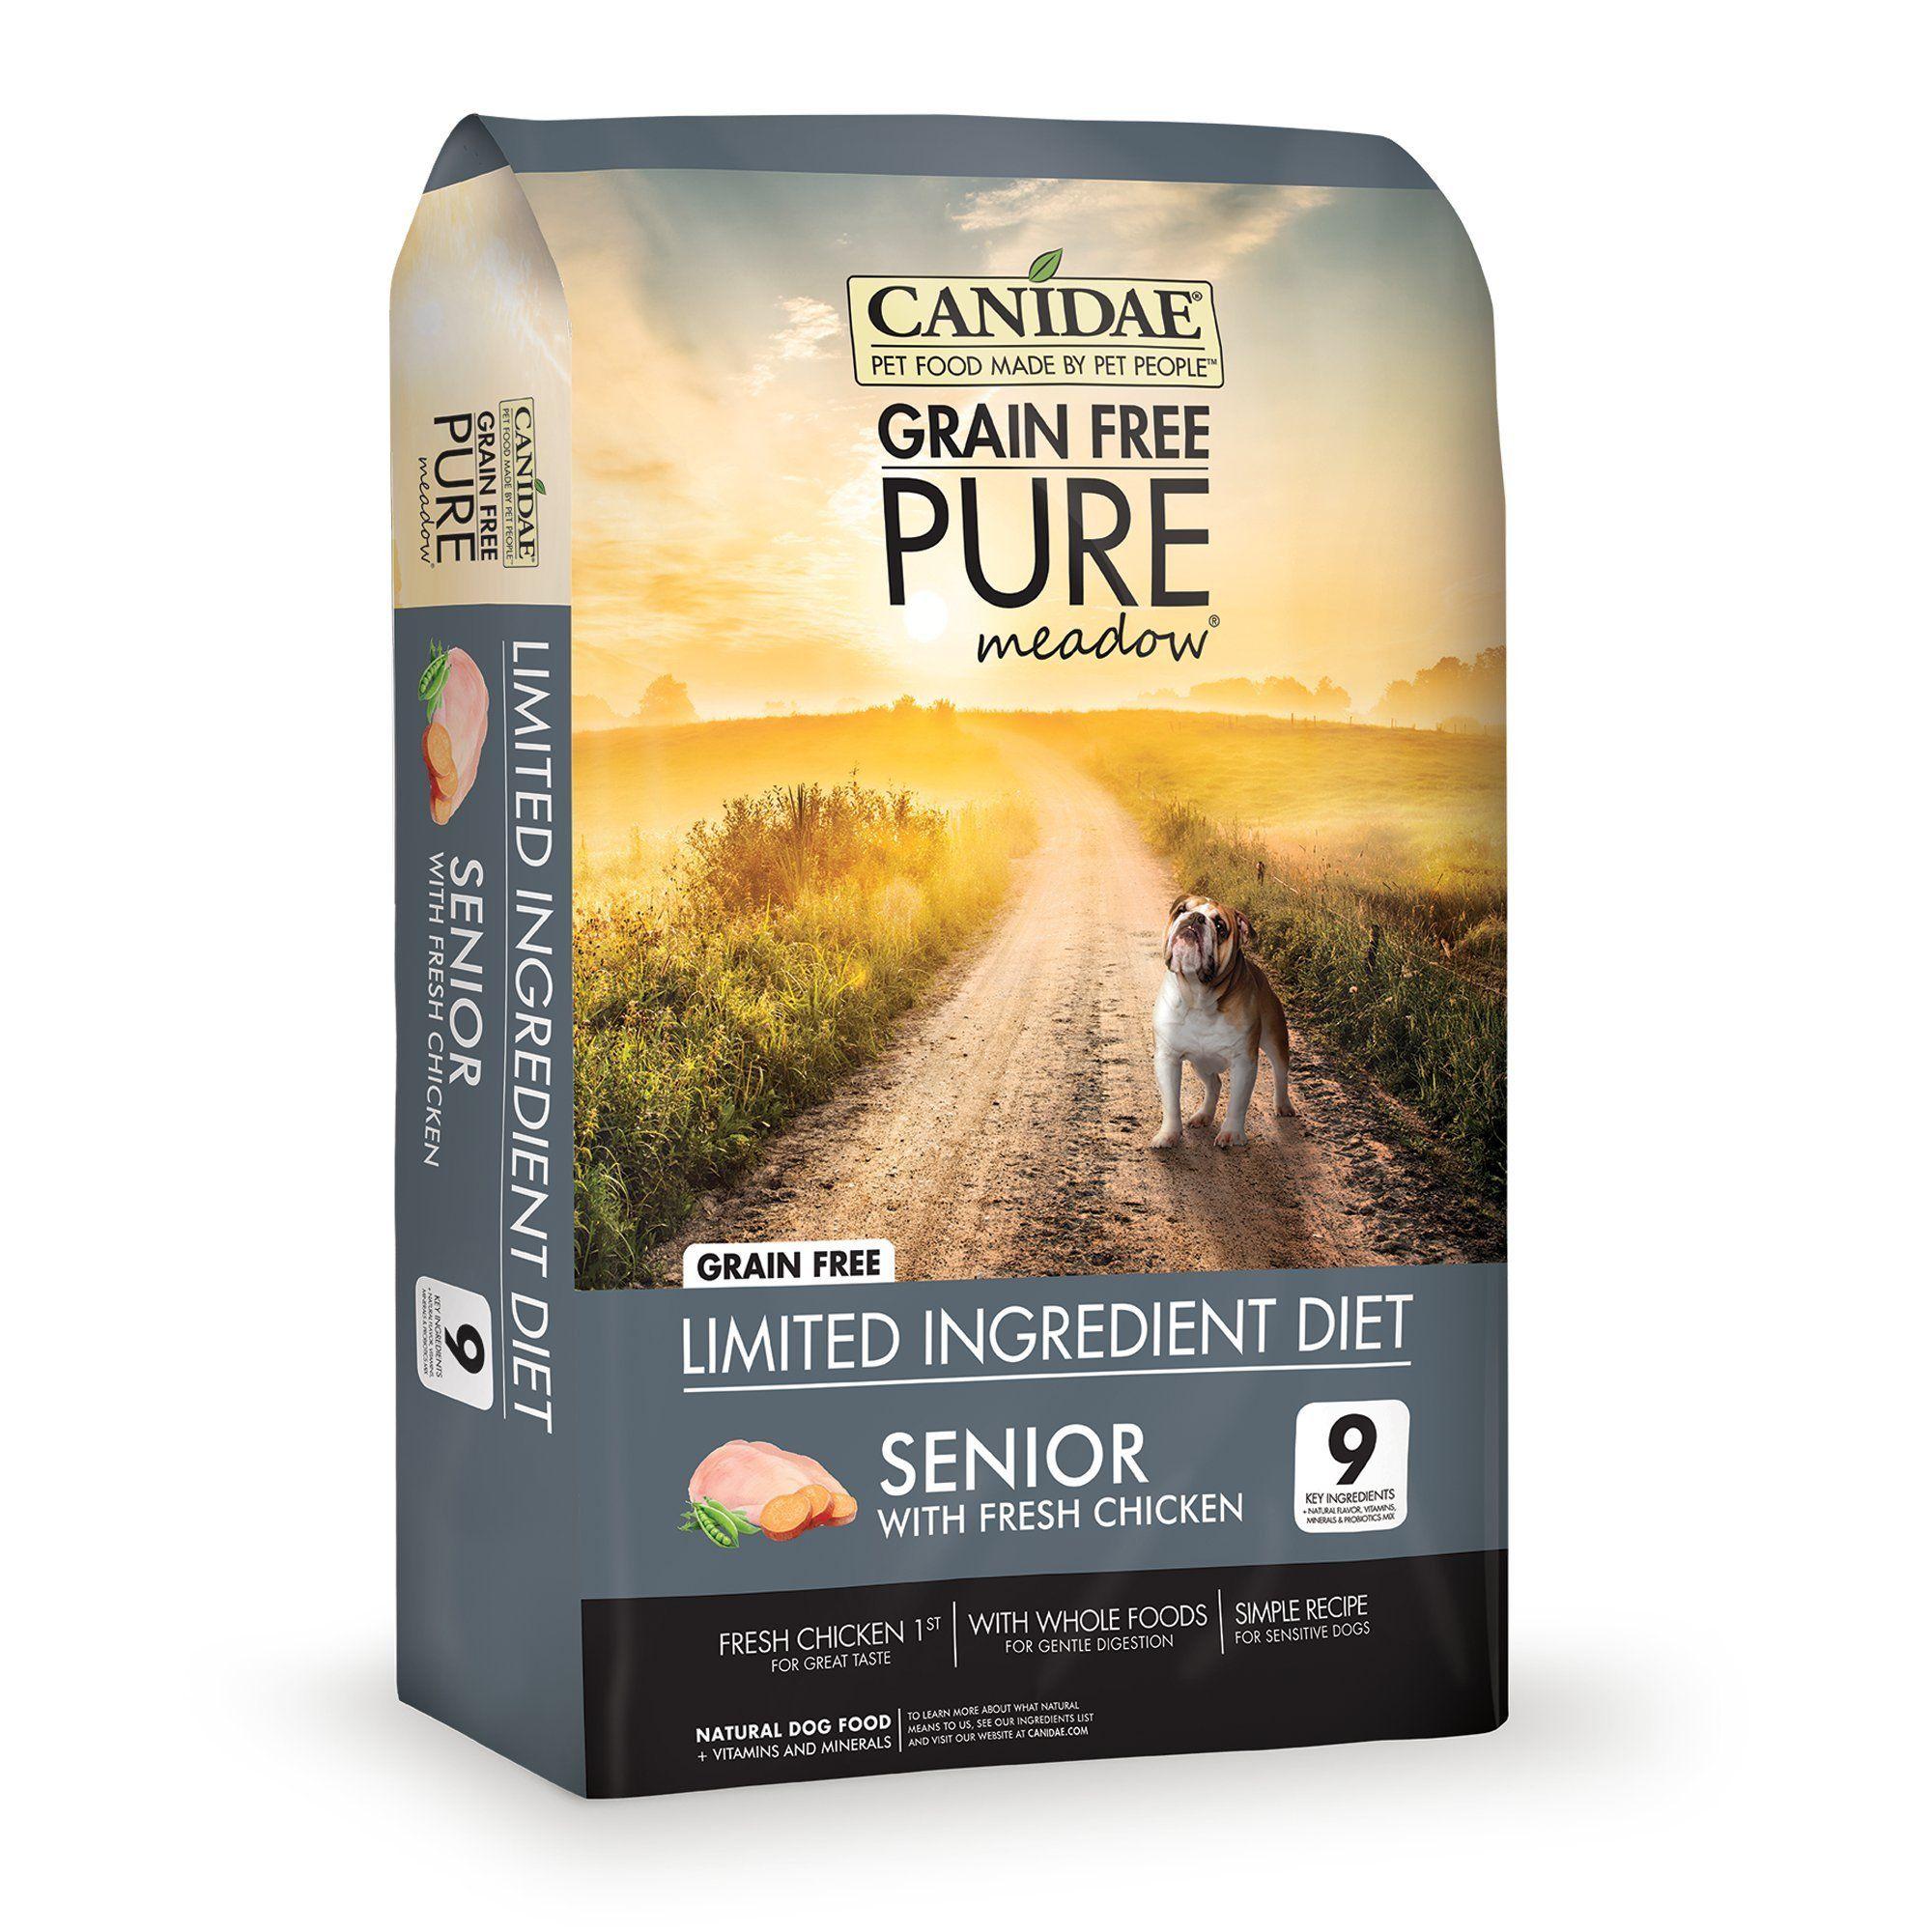 Canidae Grain Free Pure Meadow Senior Fresh Chicken Dog Food 4 Lbs